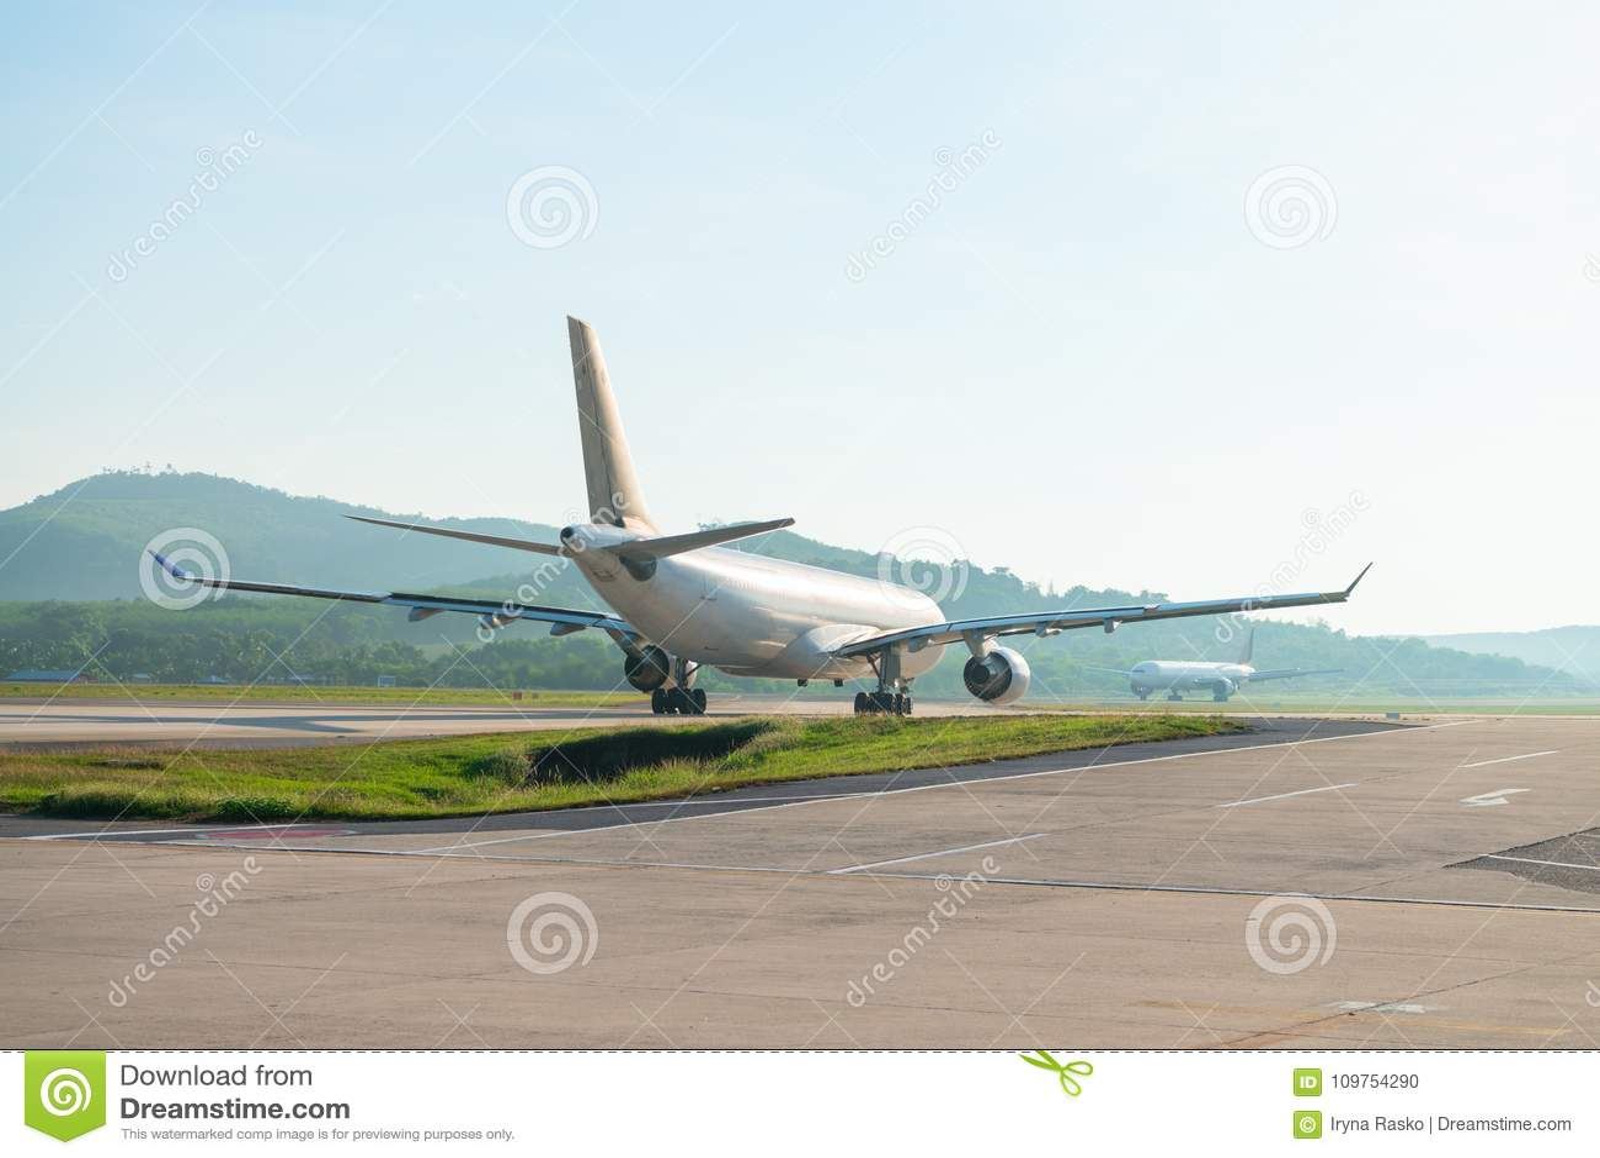 Big passenger airplanes on runway strip